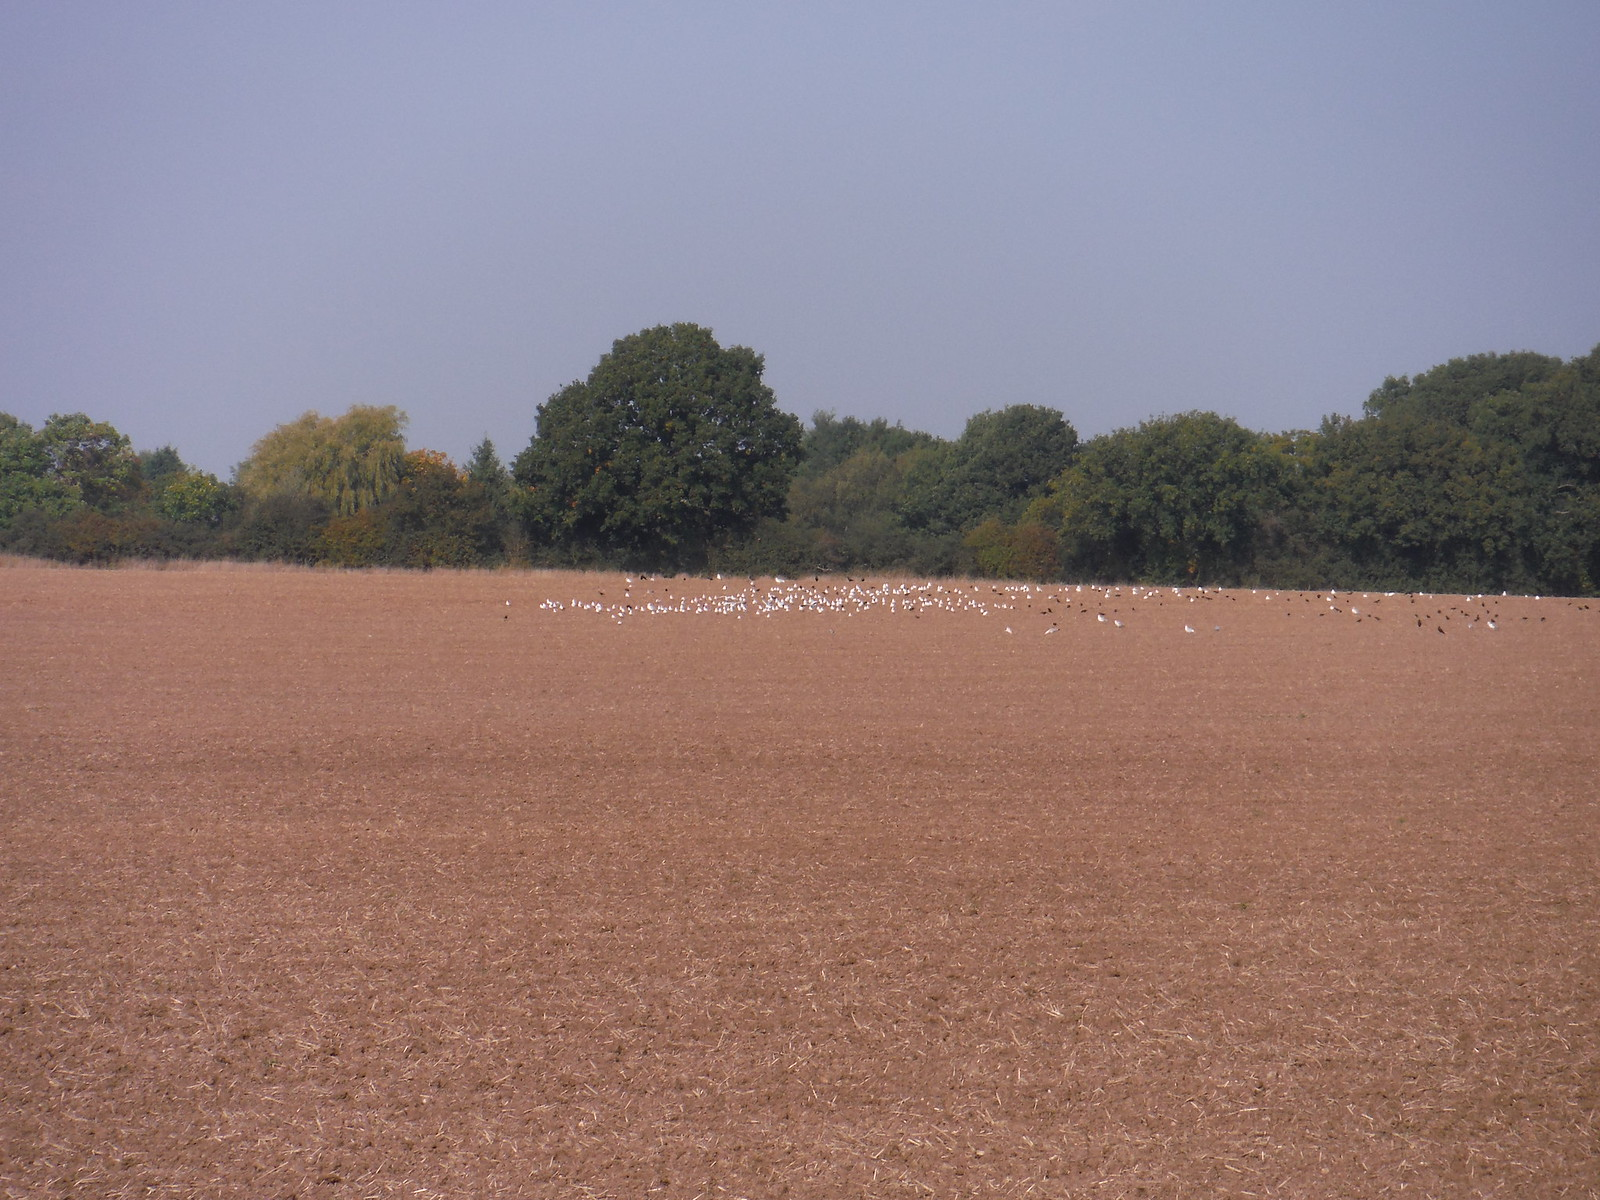 Birds in Field SWC Walk 159 South Woodham Ferrers to North Fambridge